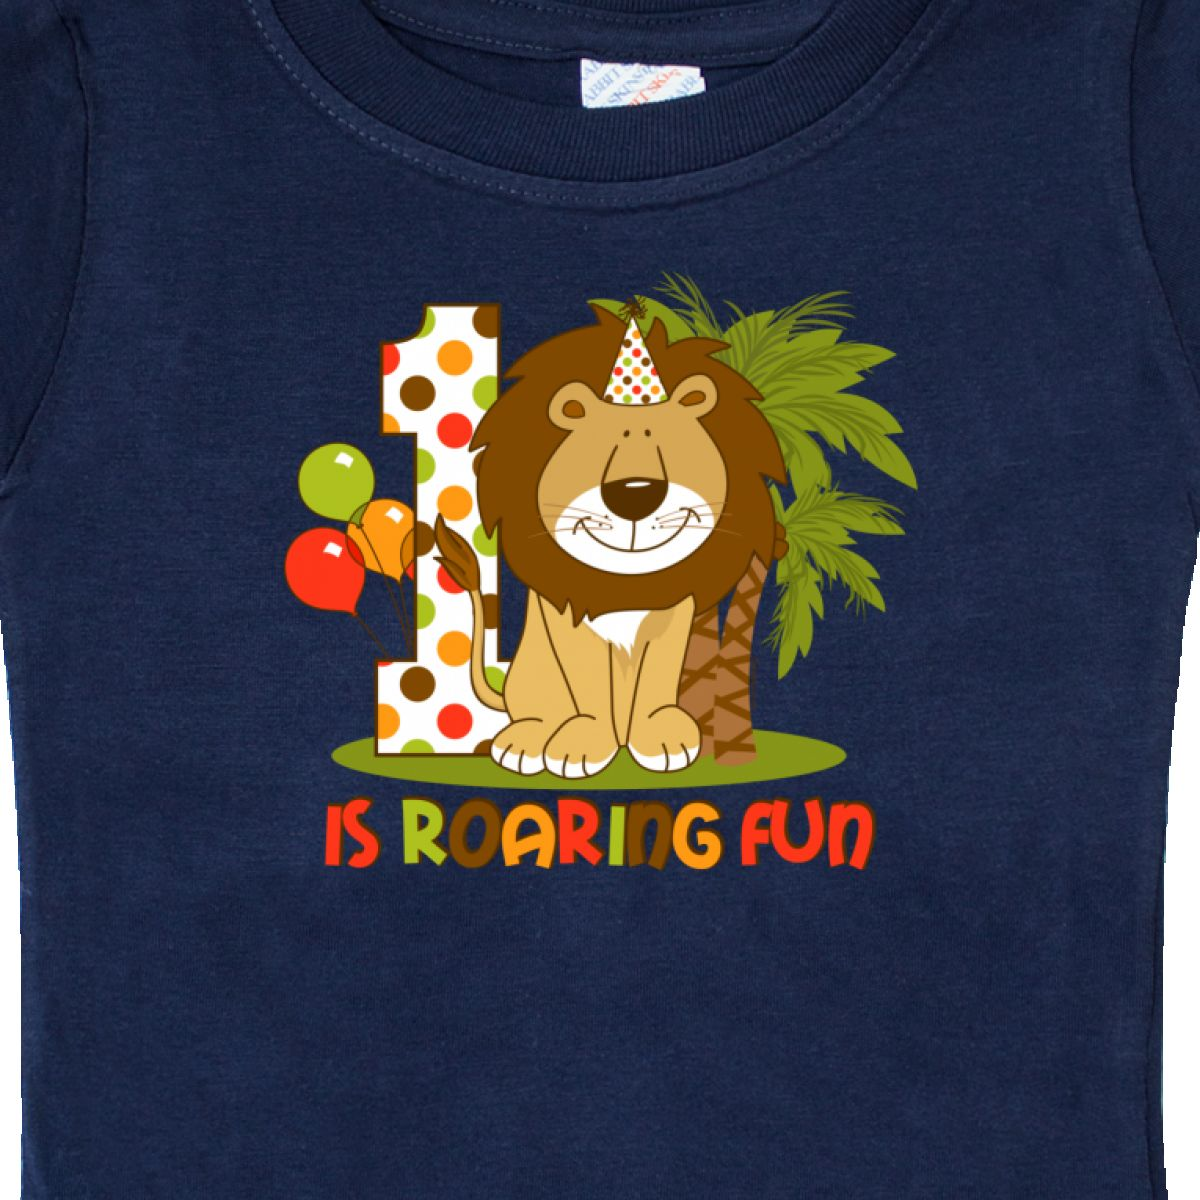 Inktastic-Cute-Lion-1st-Birthday-Baby-T-Shirt-Roaring-Fun-Pinkinkartkids-First thumbnail 14